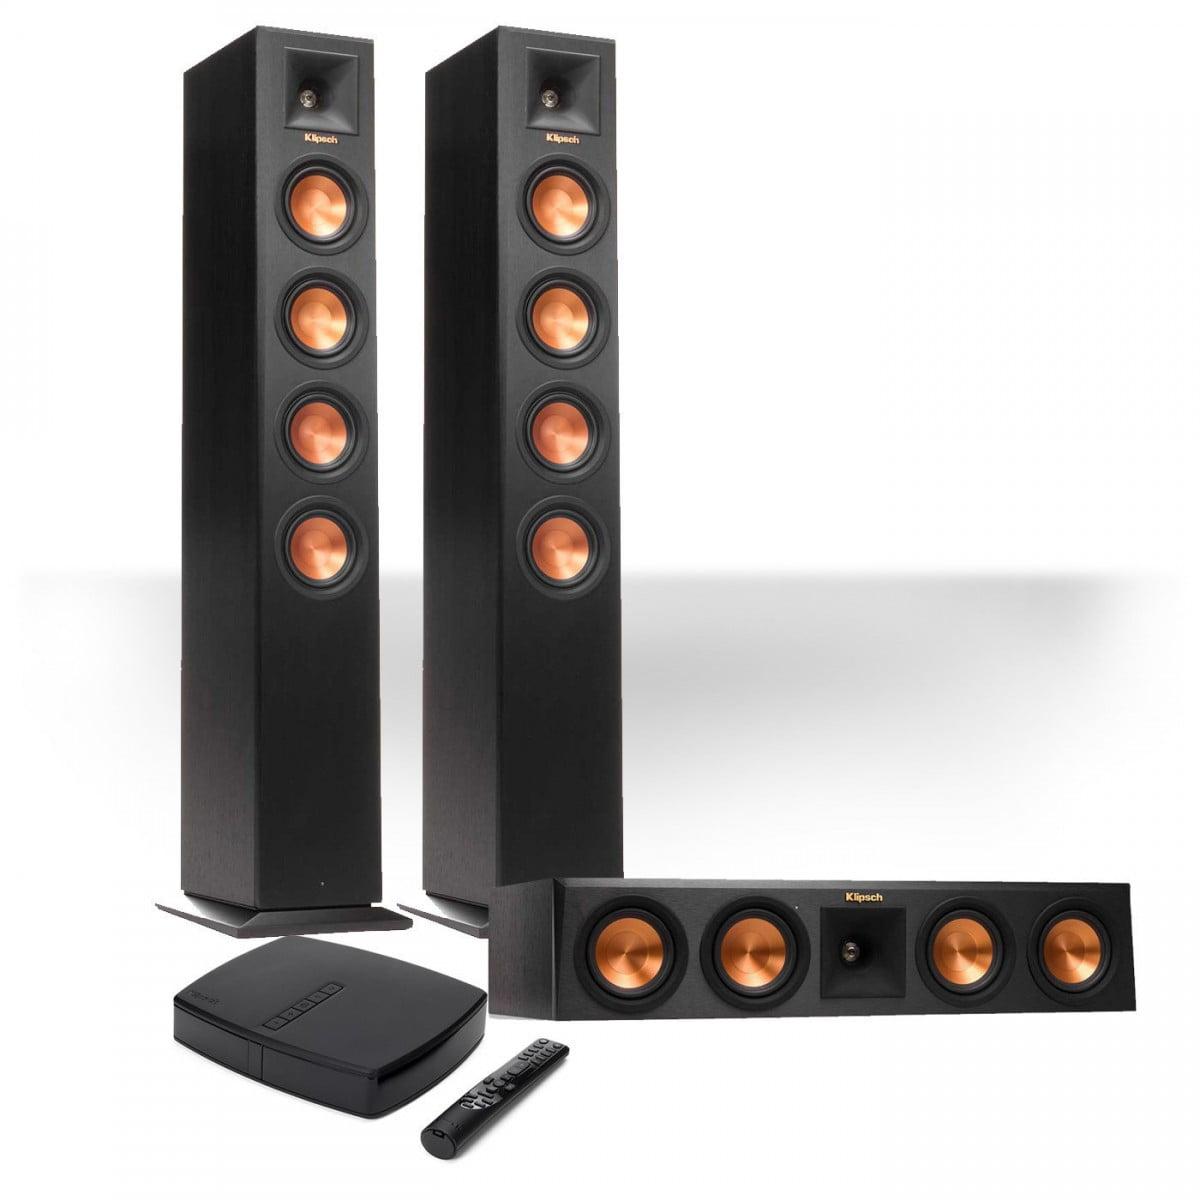 klipsch home speakers. klipsch reference premiere hd wireless 3.0-channel floorstanding speaker system home speakers